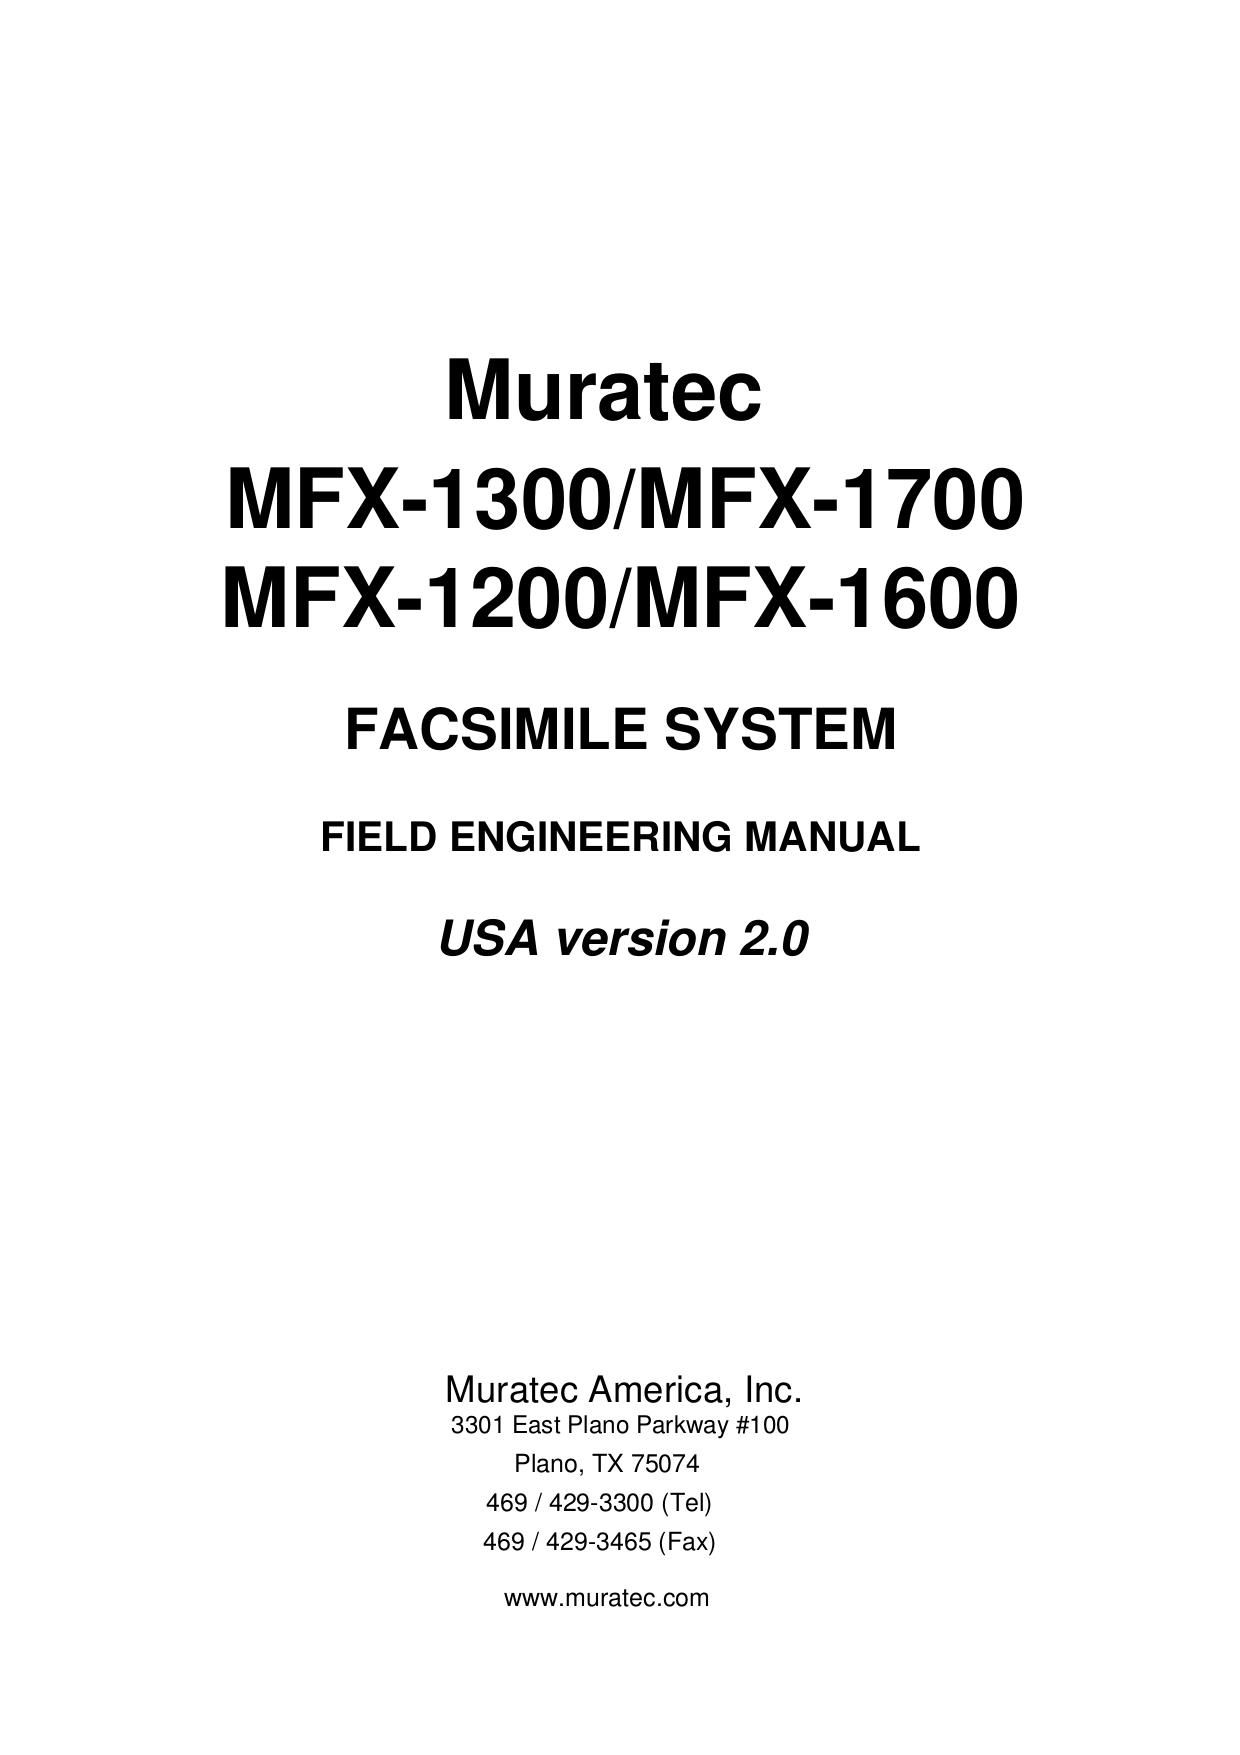 Download free pdf for muratec mfx 1700 copier manual pdf for muratec copier mfx 1700 manual hexwebz Images